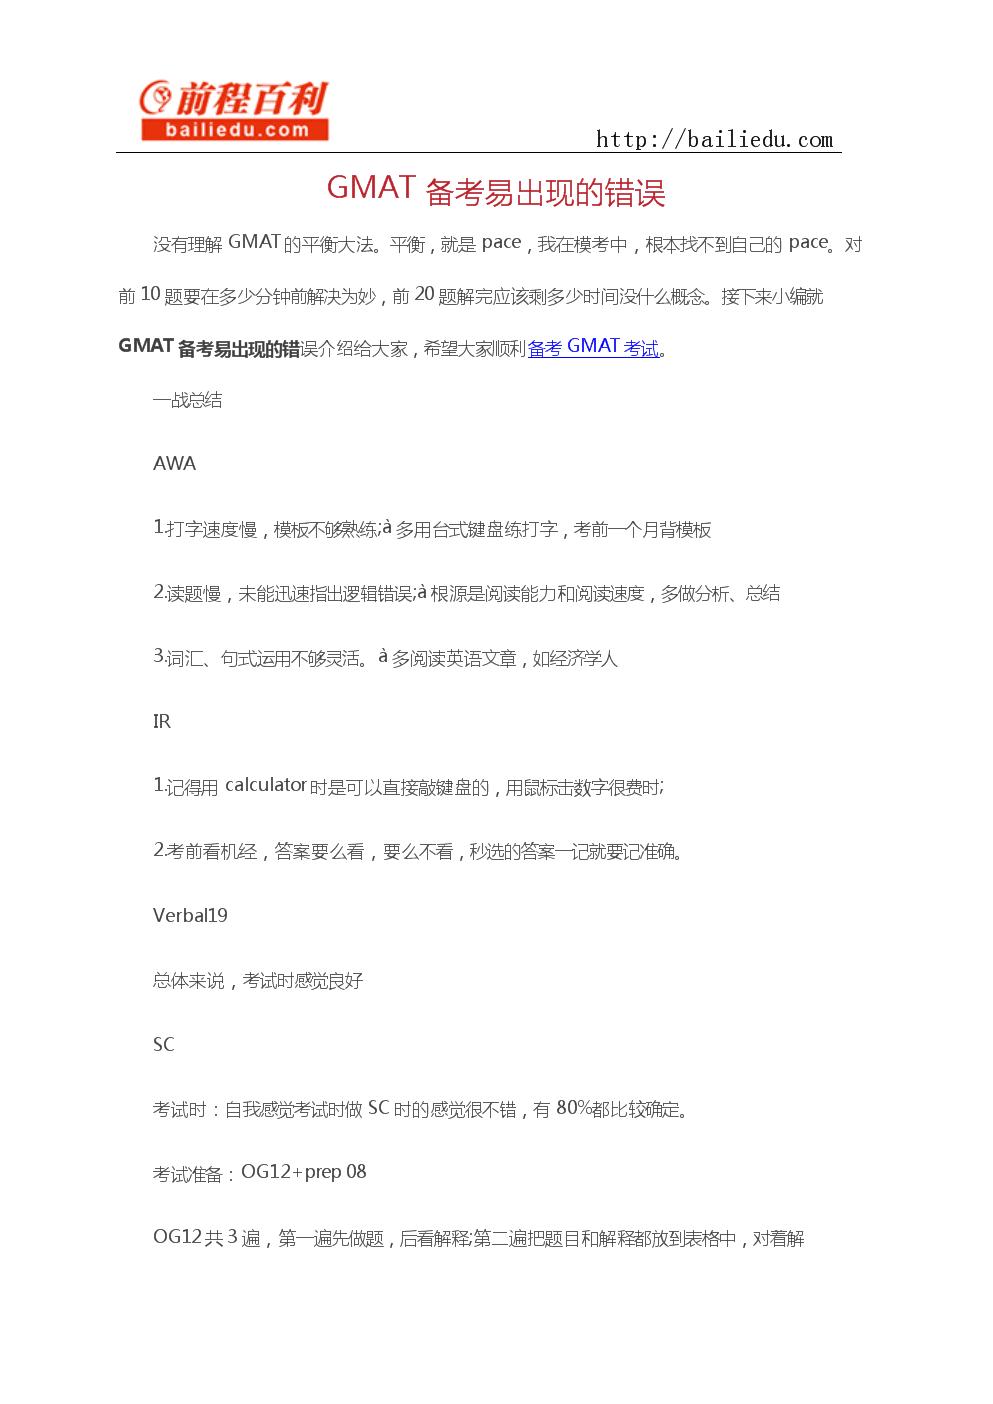 GMAT备考易出现的错误.docx